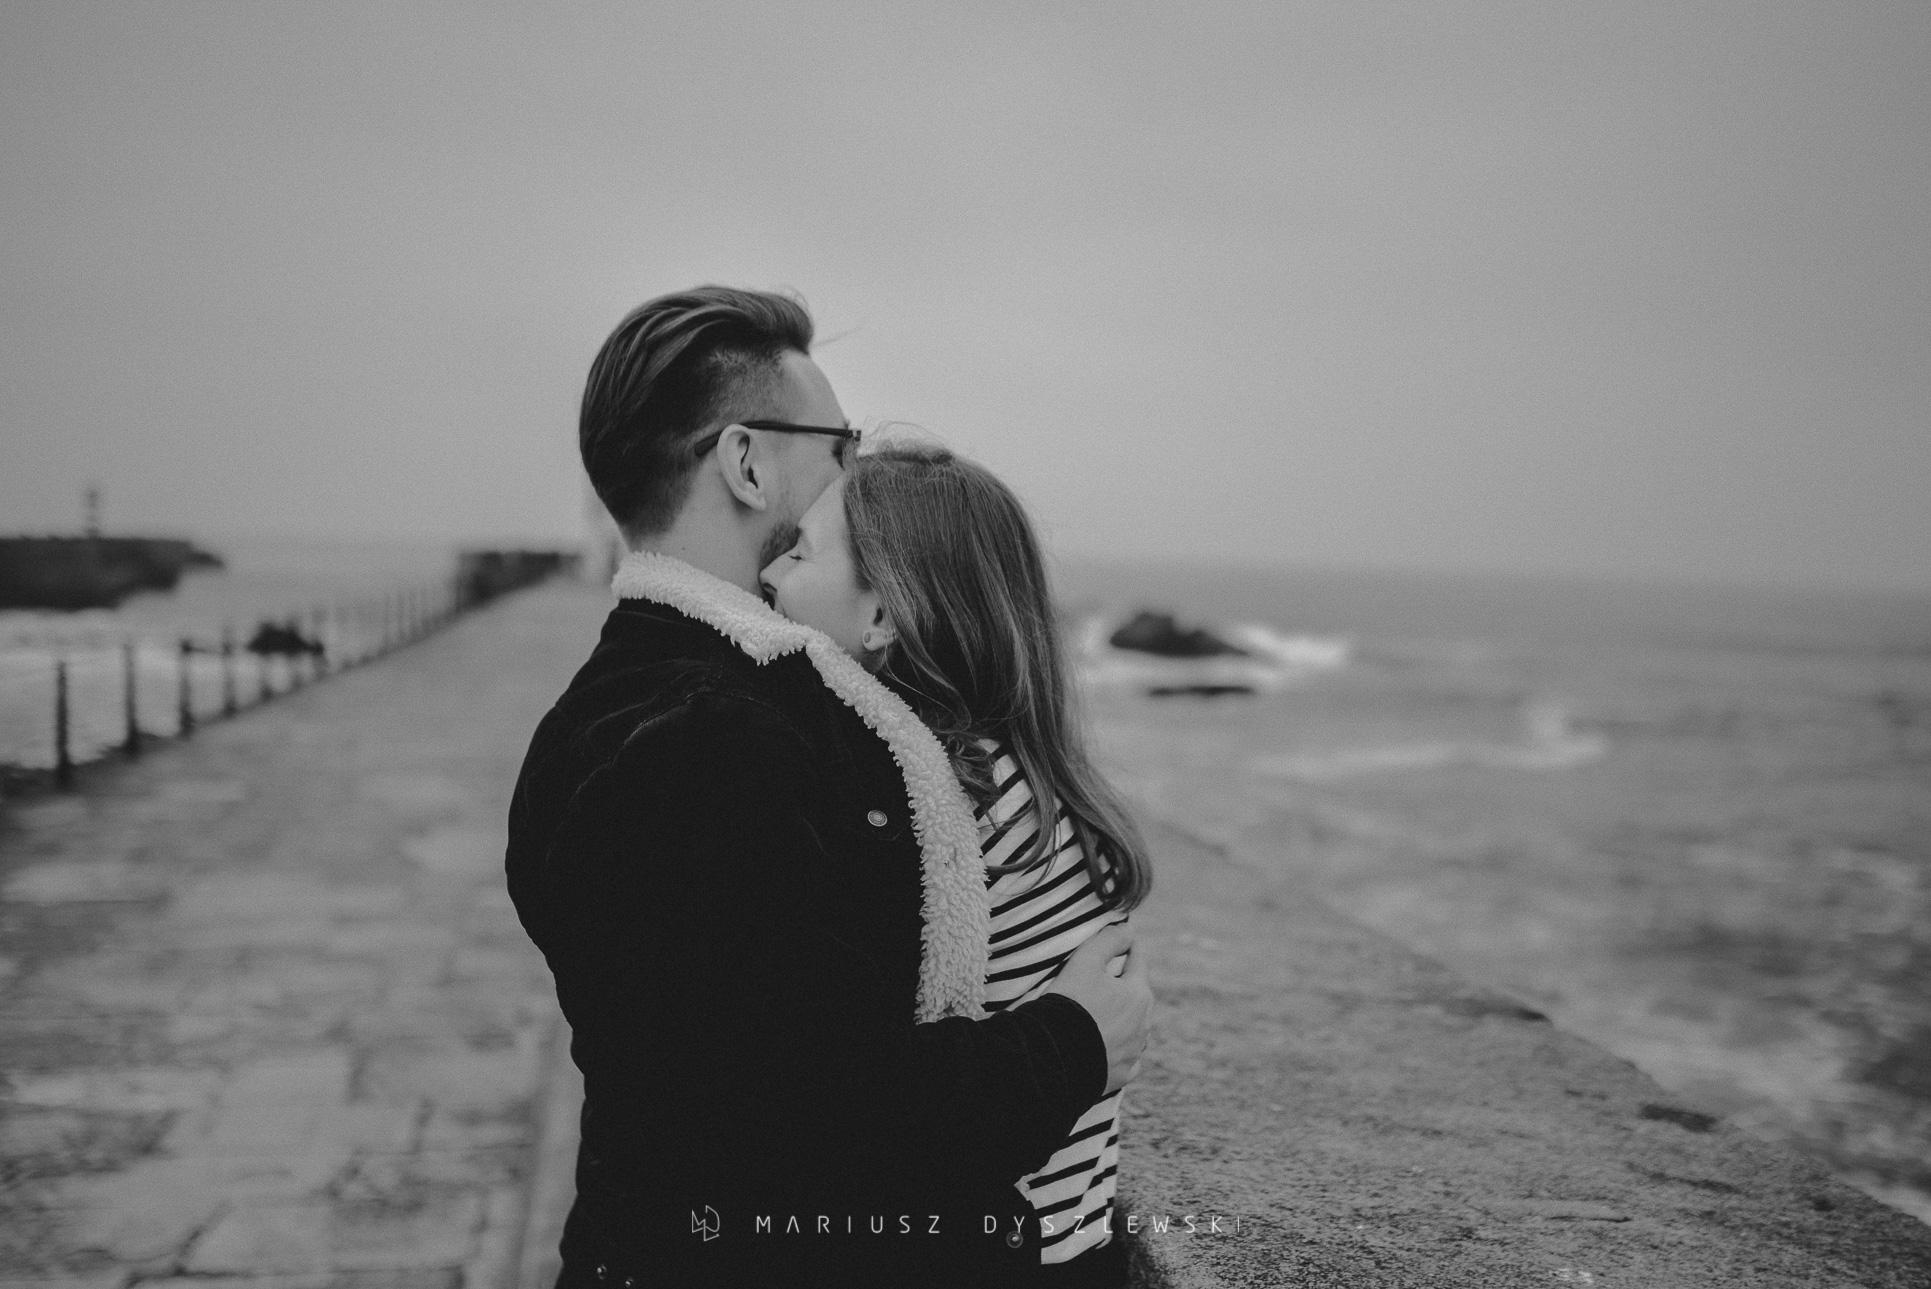 Mariusz Dyszlewski wedding photographer